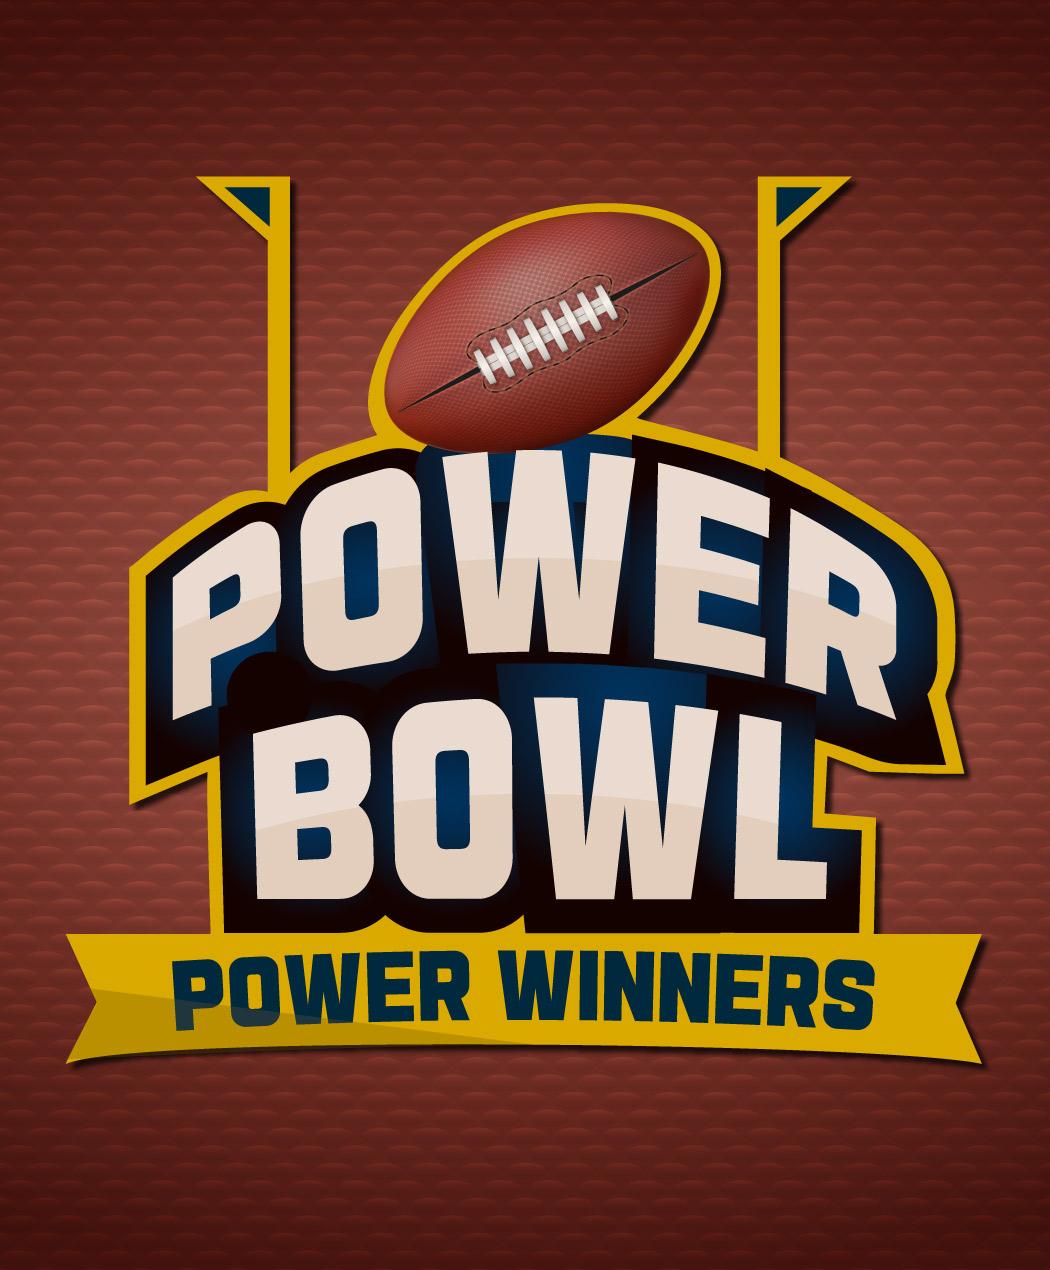 Power Bowl Power Winners